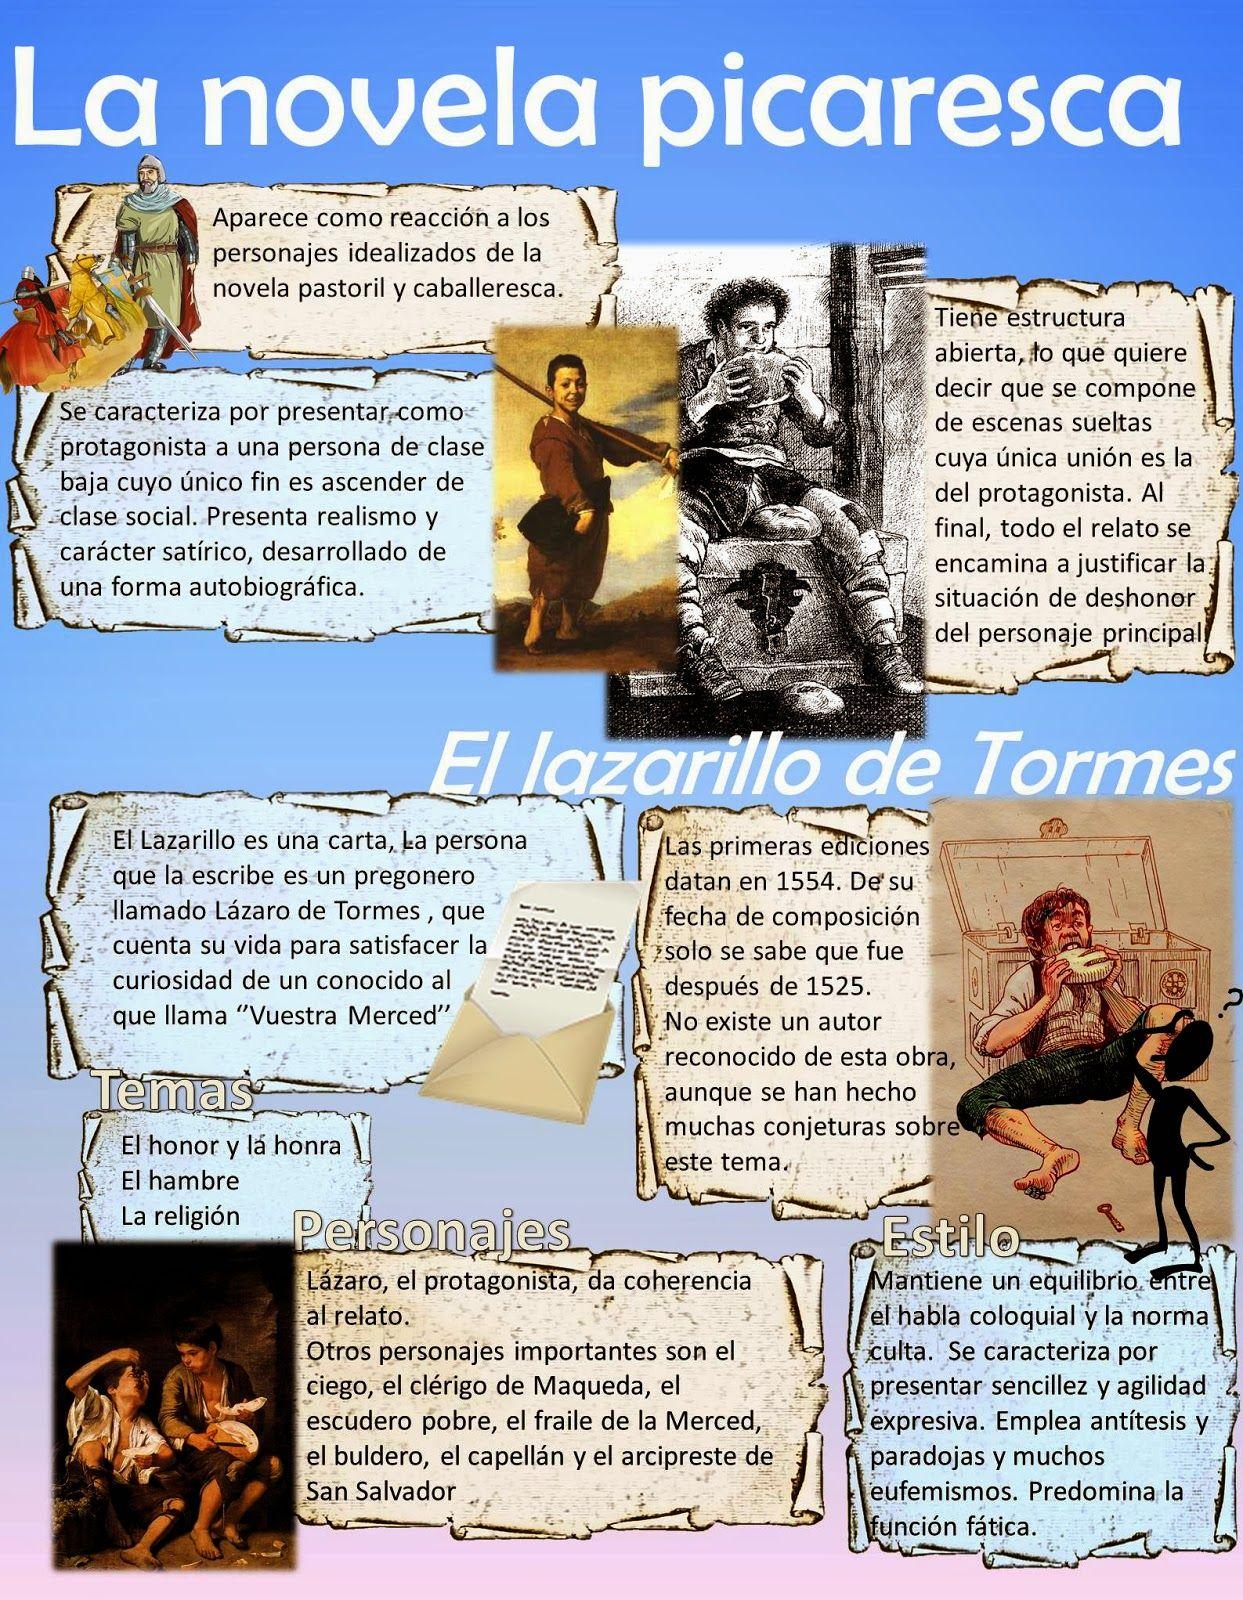 La Novela Picaresca Clases De Literatura Apuntes De Lengua Enseñanza De La Literatura